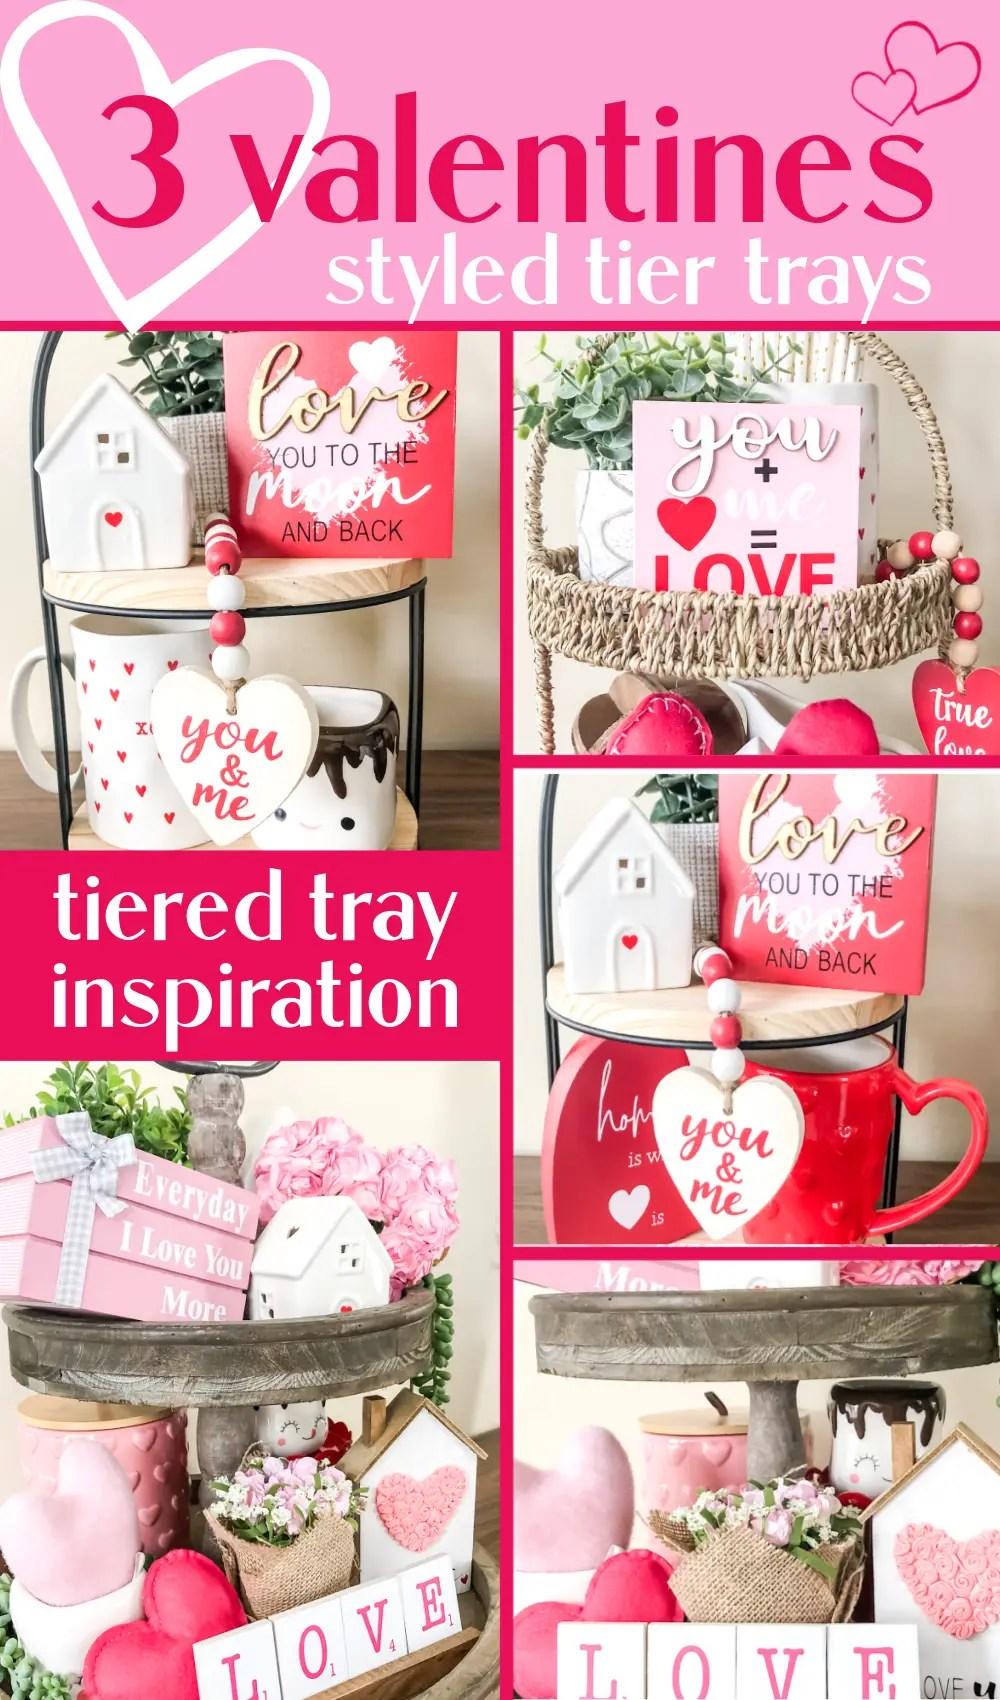 Three ways to style Valentine's day tiered trays